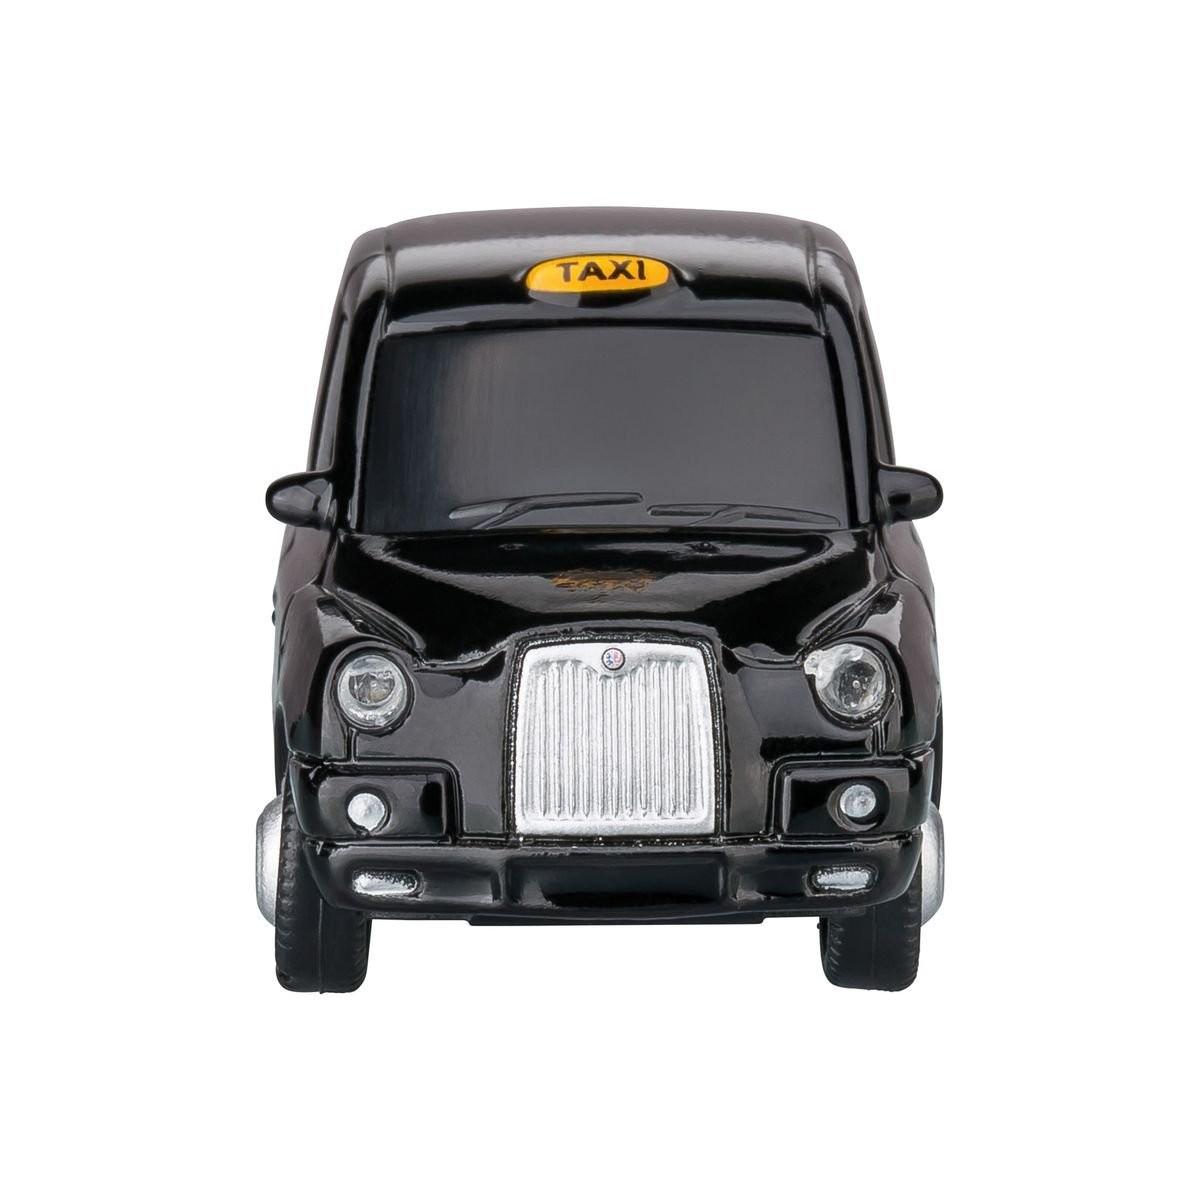 USB-Speicherstick London Taxi TX4 1:72 BLACK 16GB, Ansicht 6